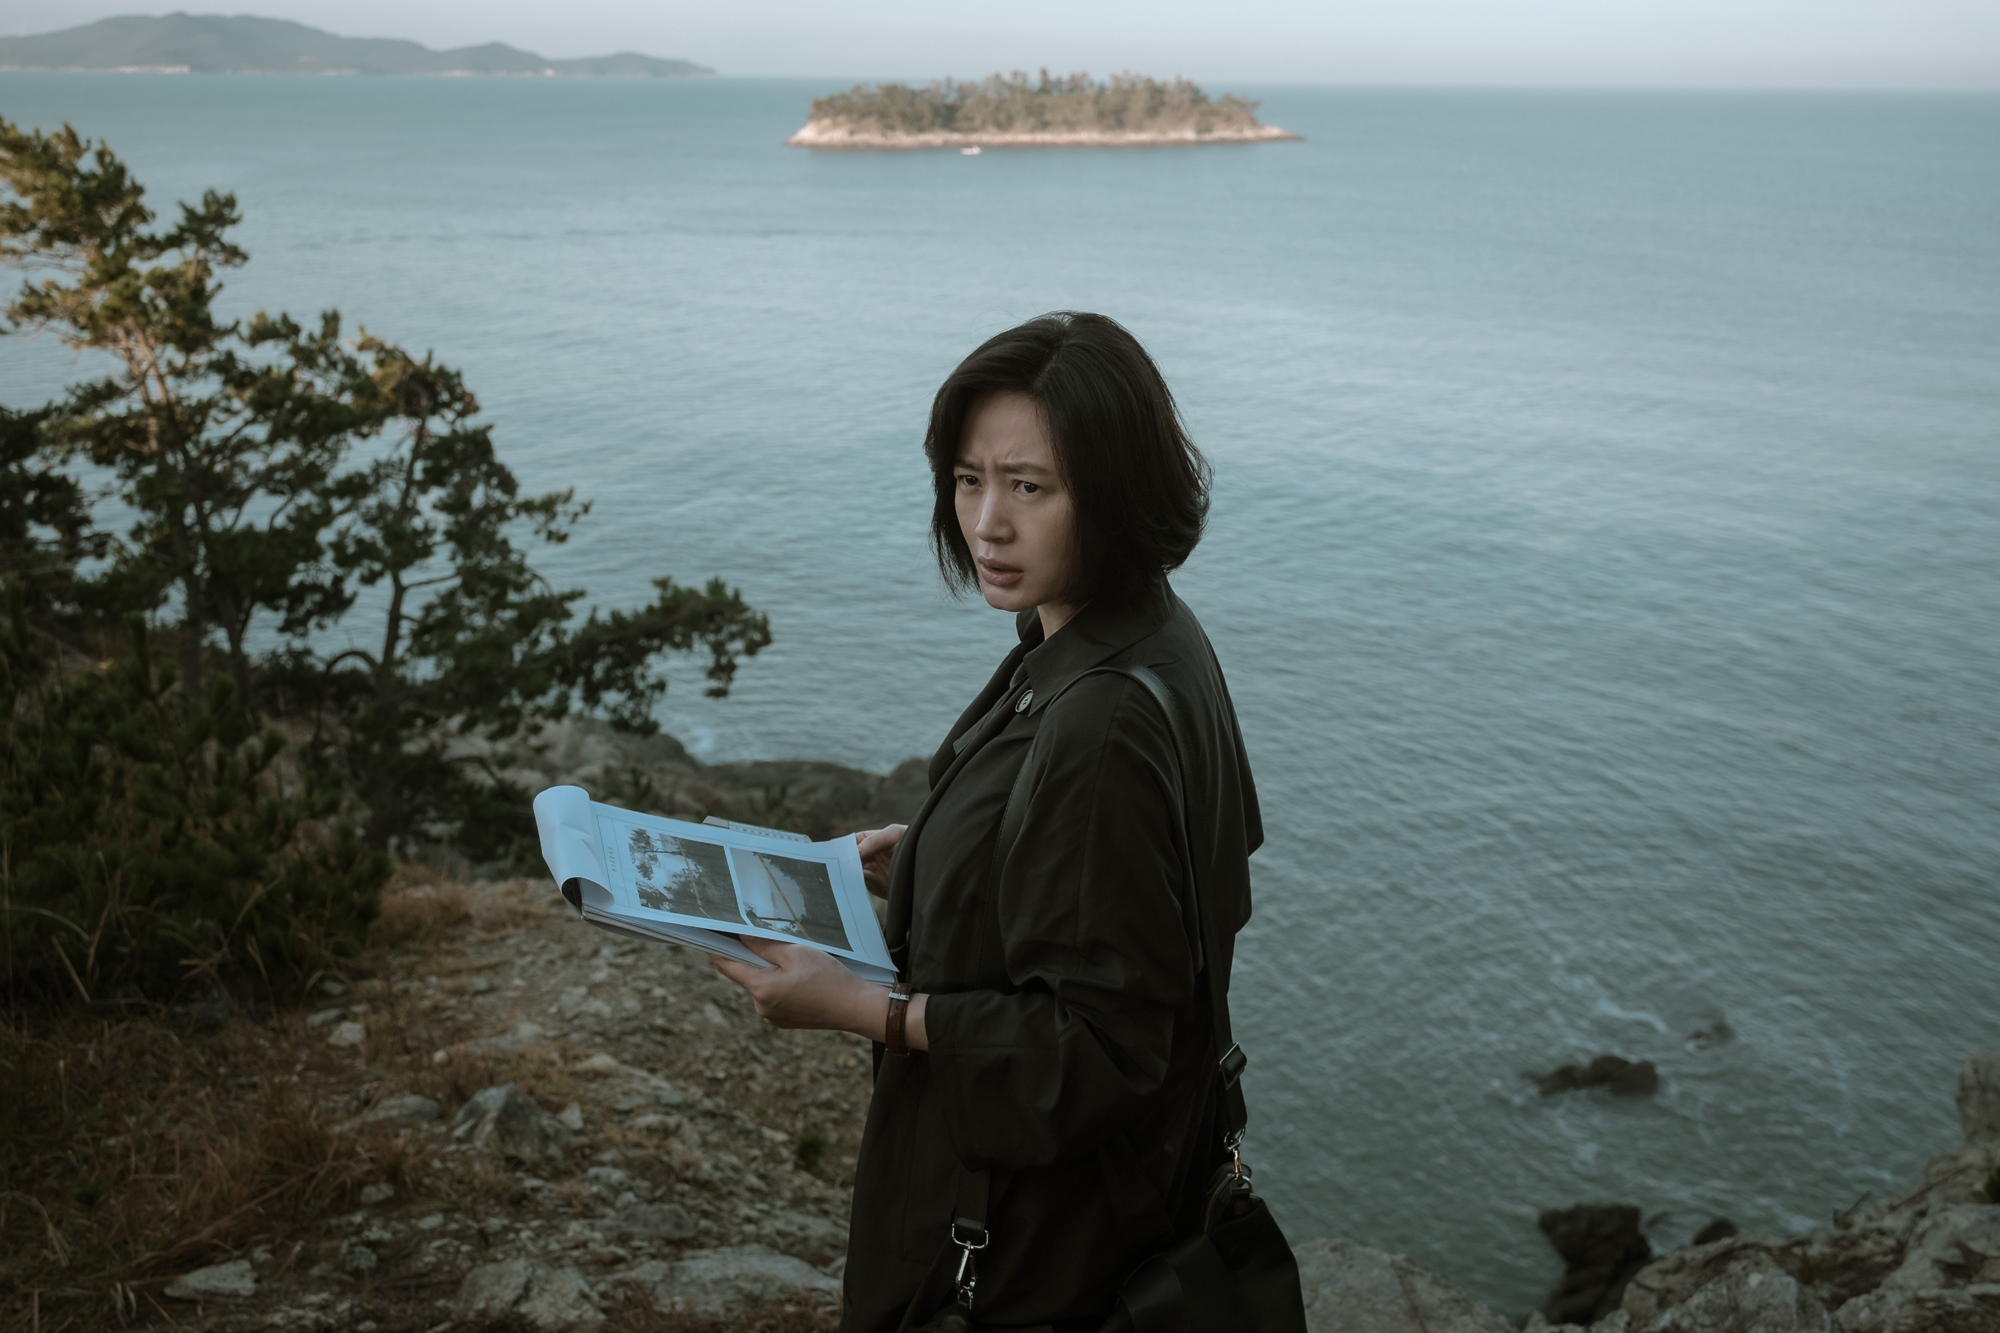 Xem Phim Di Nguyện Bí Ẩn - The Day I Died: Unclosed Case Full Vietsub | Thuyết Minh HD Online